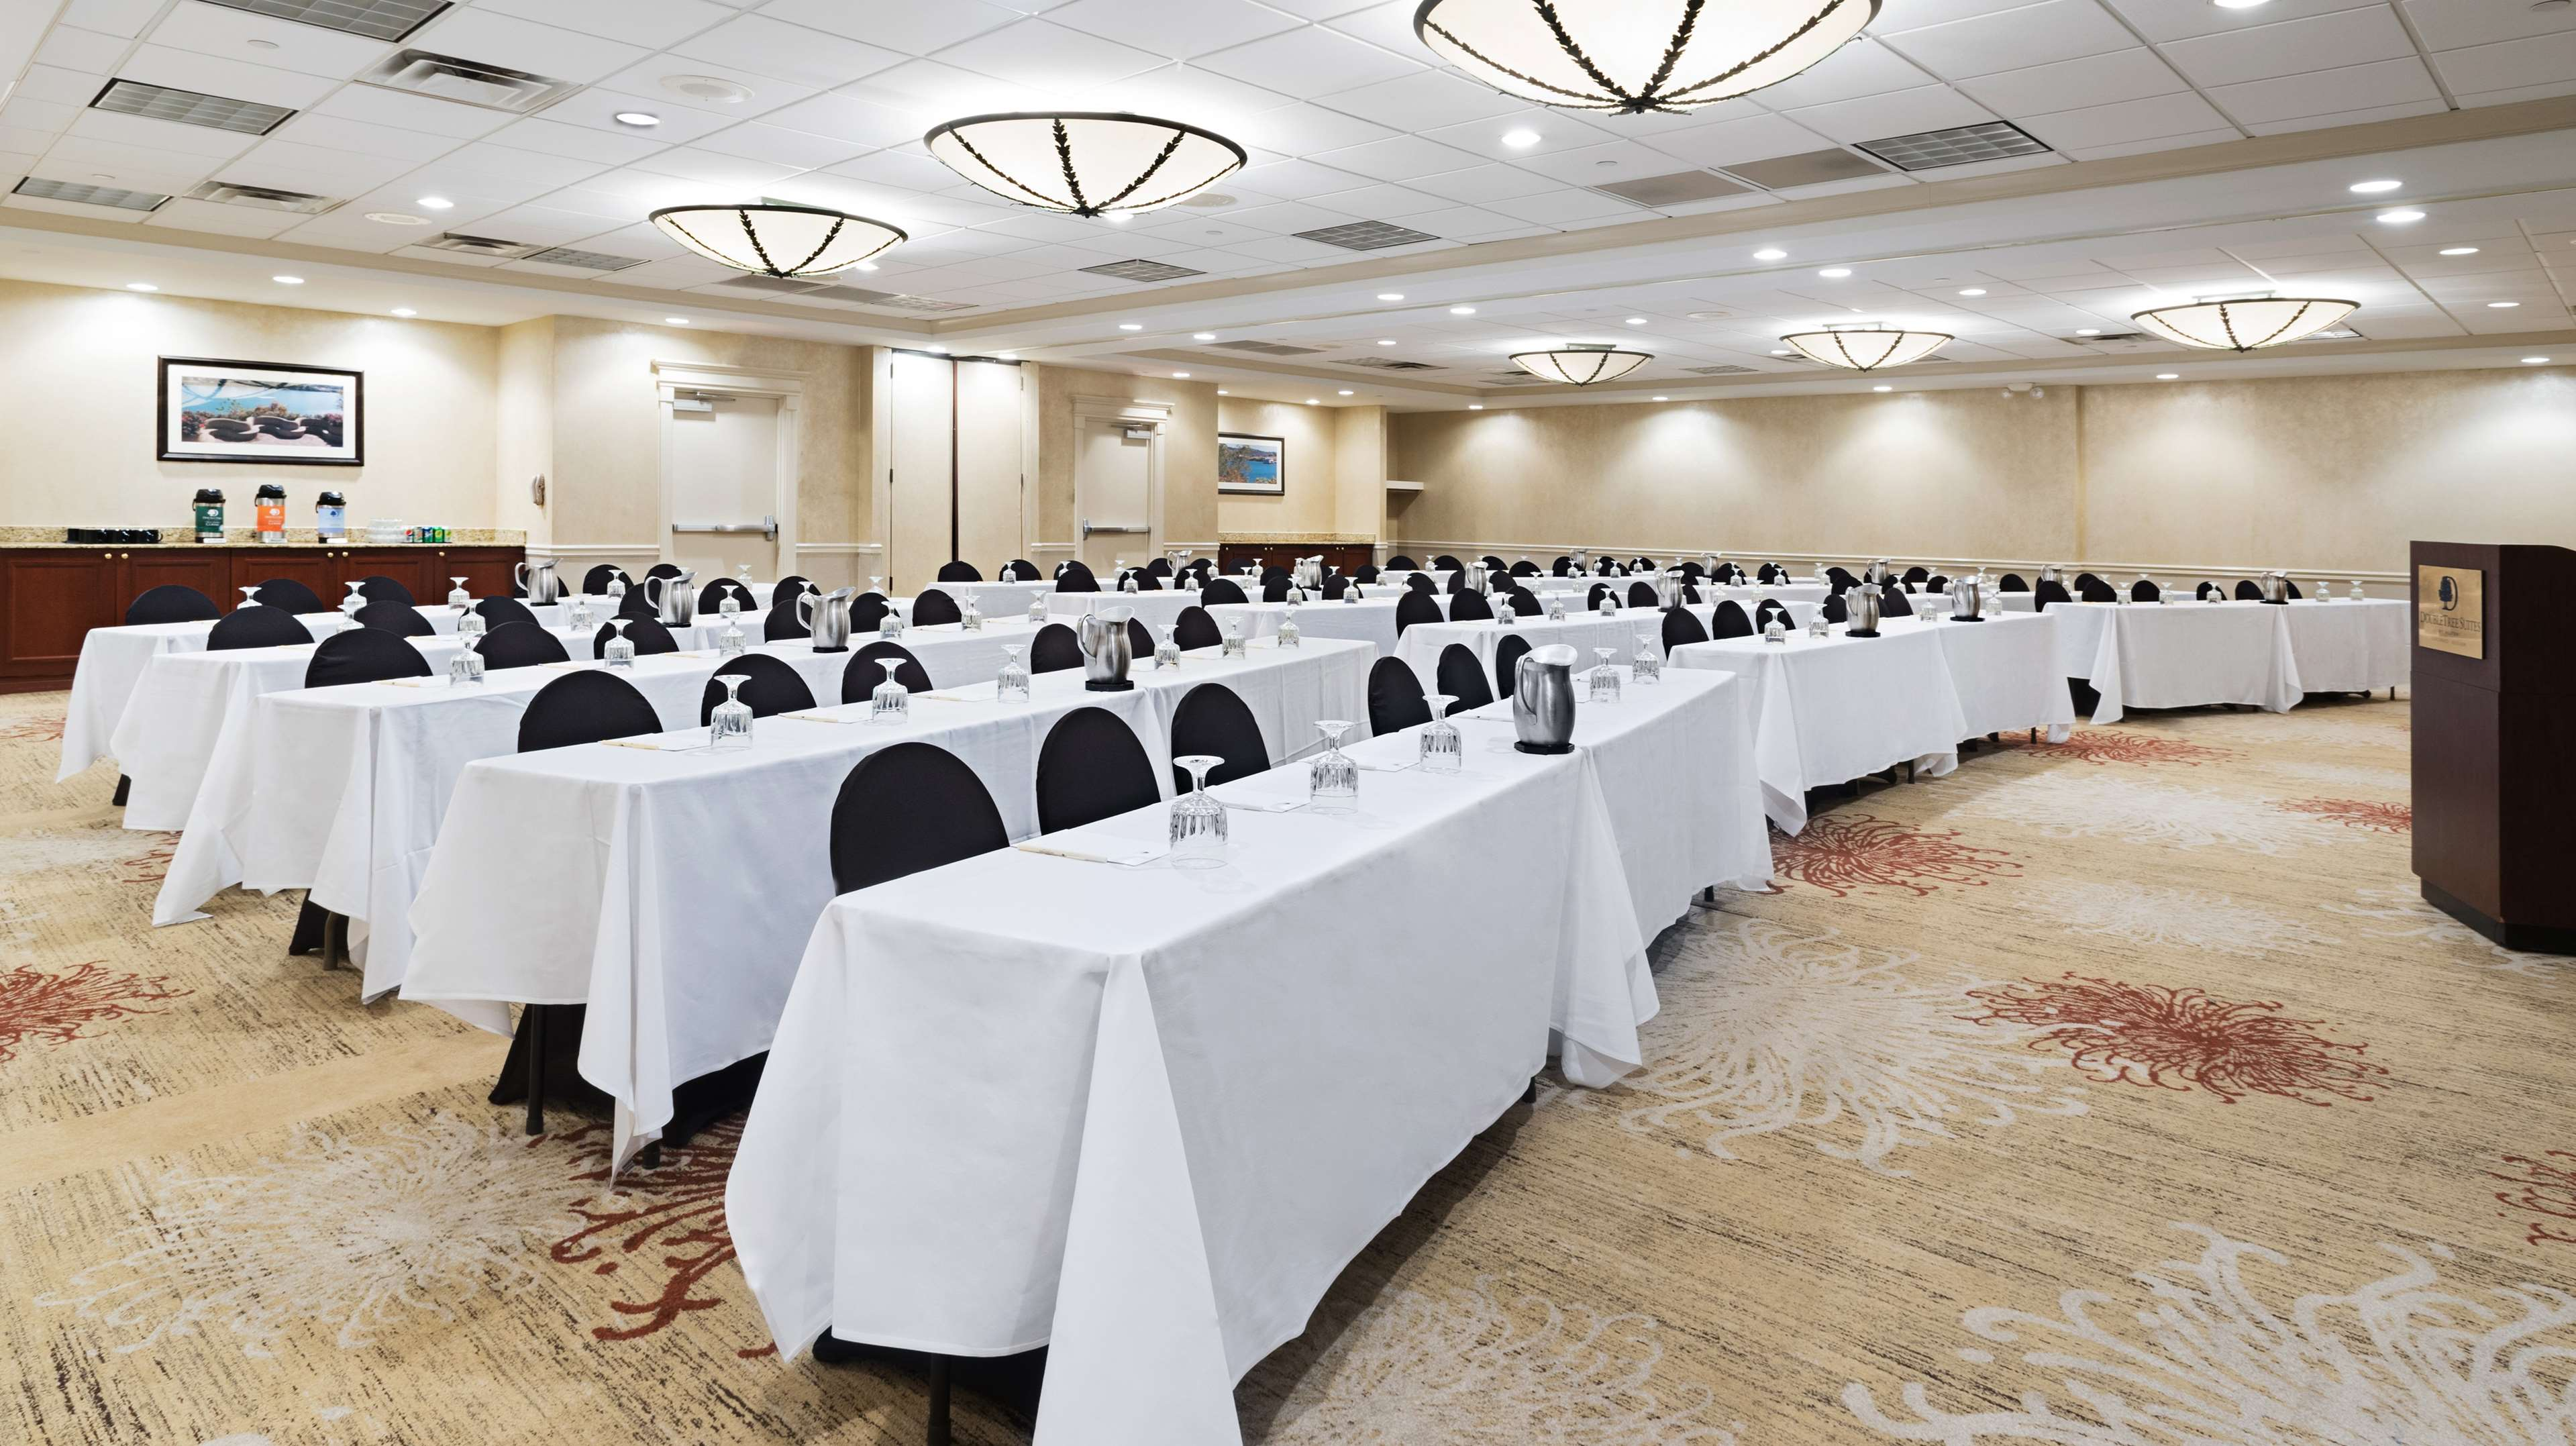 DoubleTree Suites by Hilton Hotel Cincinnati - Blue Ash image 20